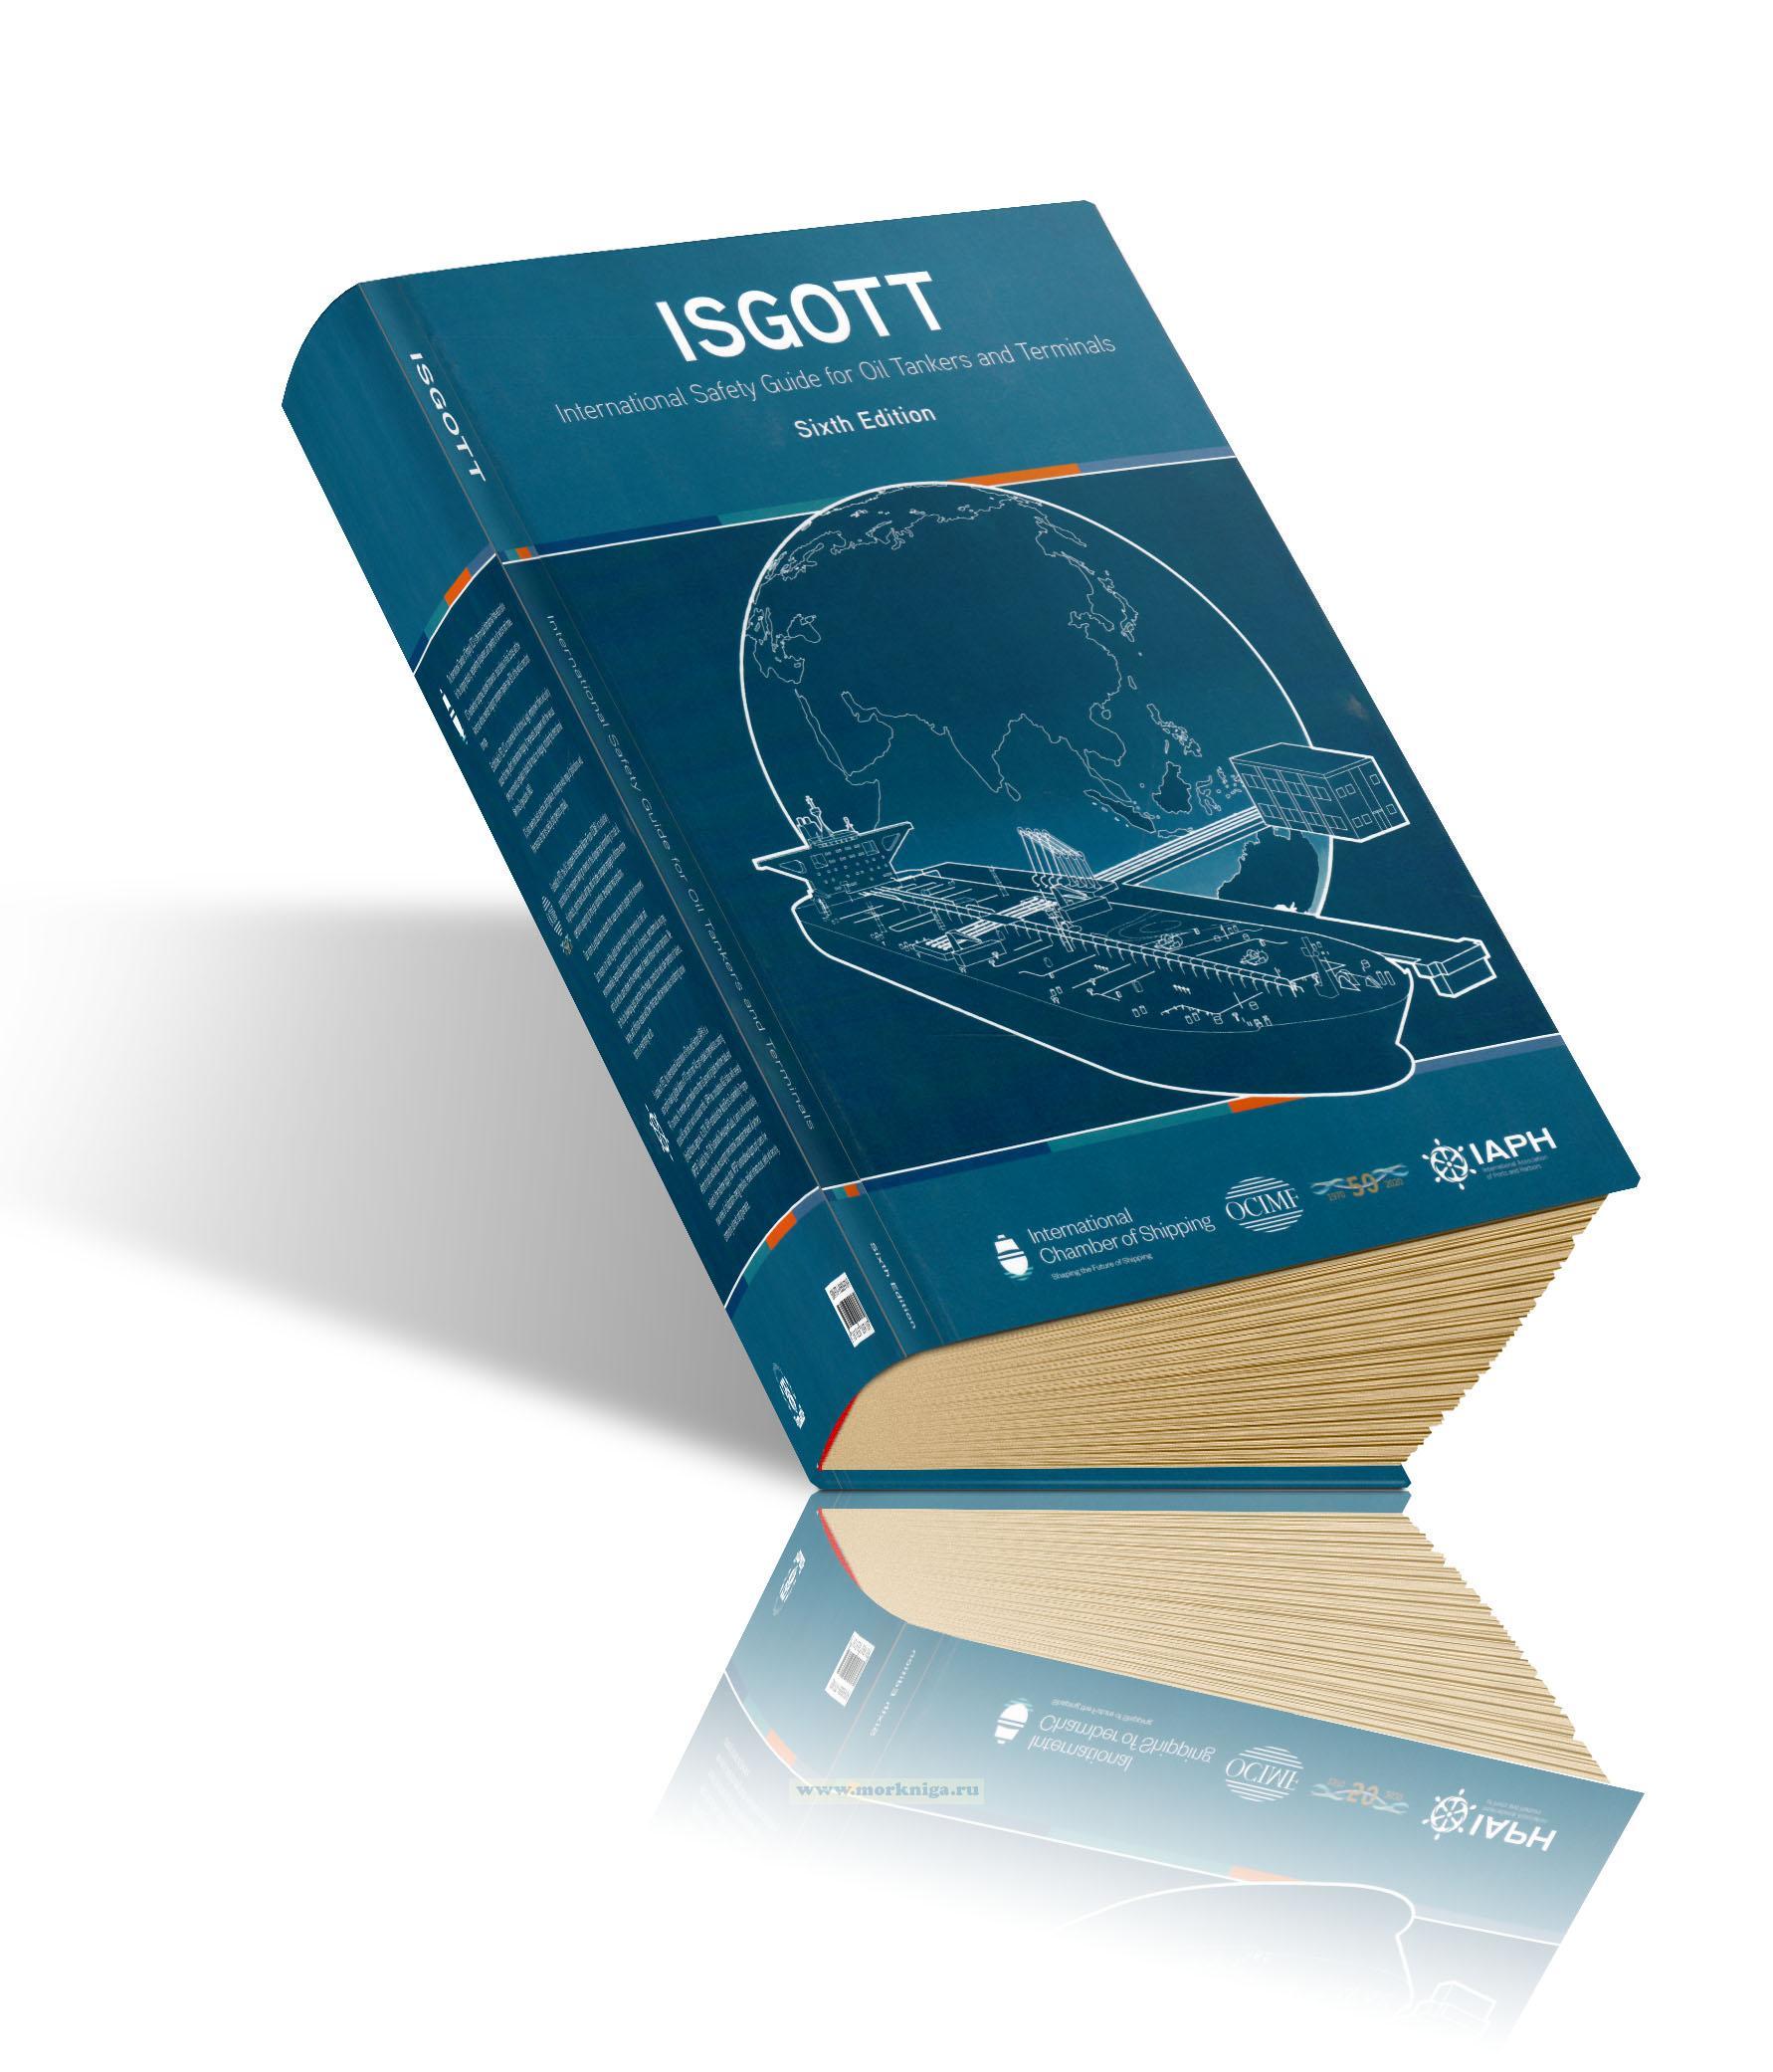 ISGOTT. International Safety Guide for Oil Tankers and Terminals/Международное руководство по безопасности для нефтяных танкеров и терминалов